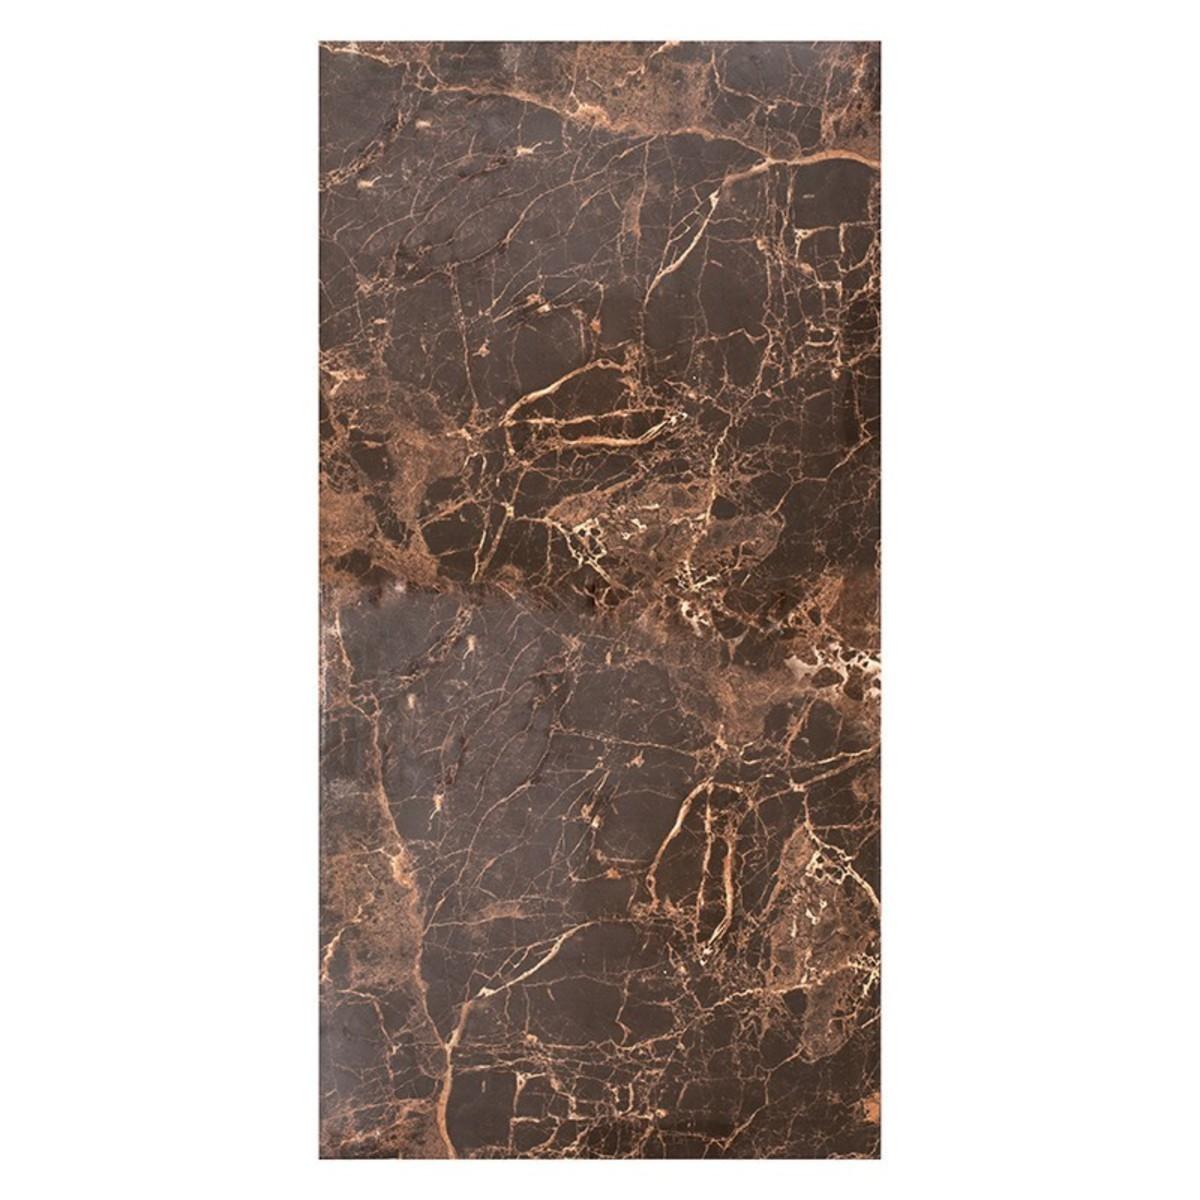 Плитка настенная Golden Tile Lorenzo Modern 30х60 см 1.44 м2 цвет коричневый